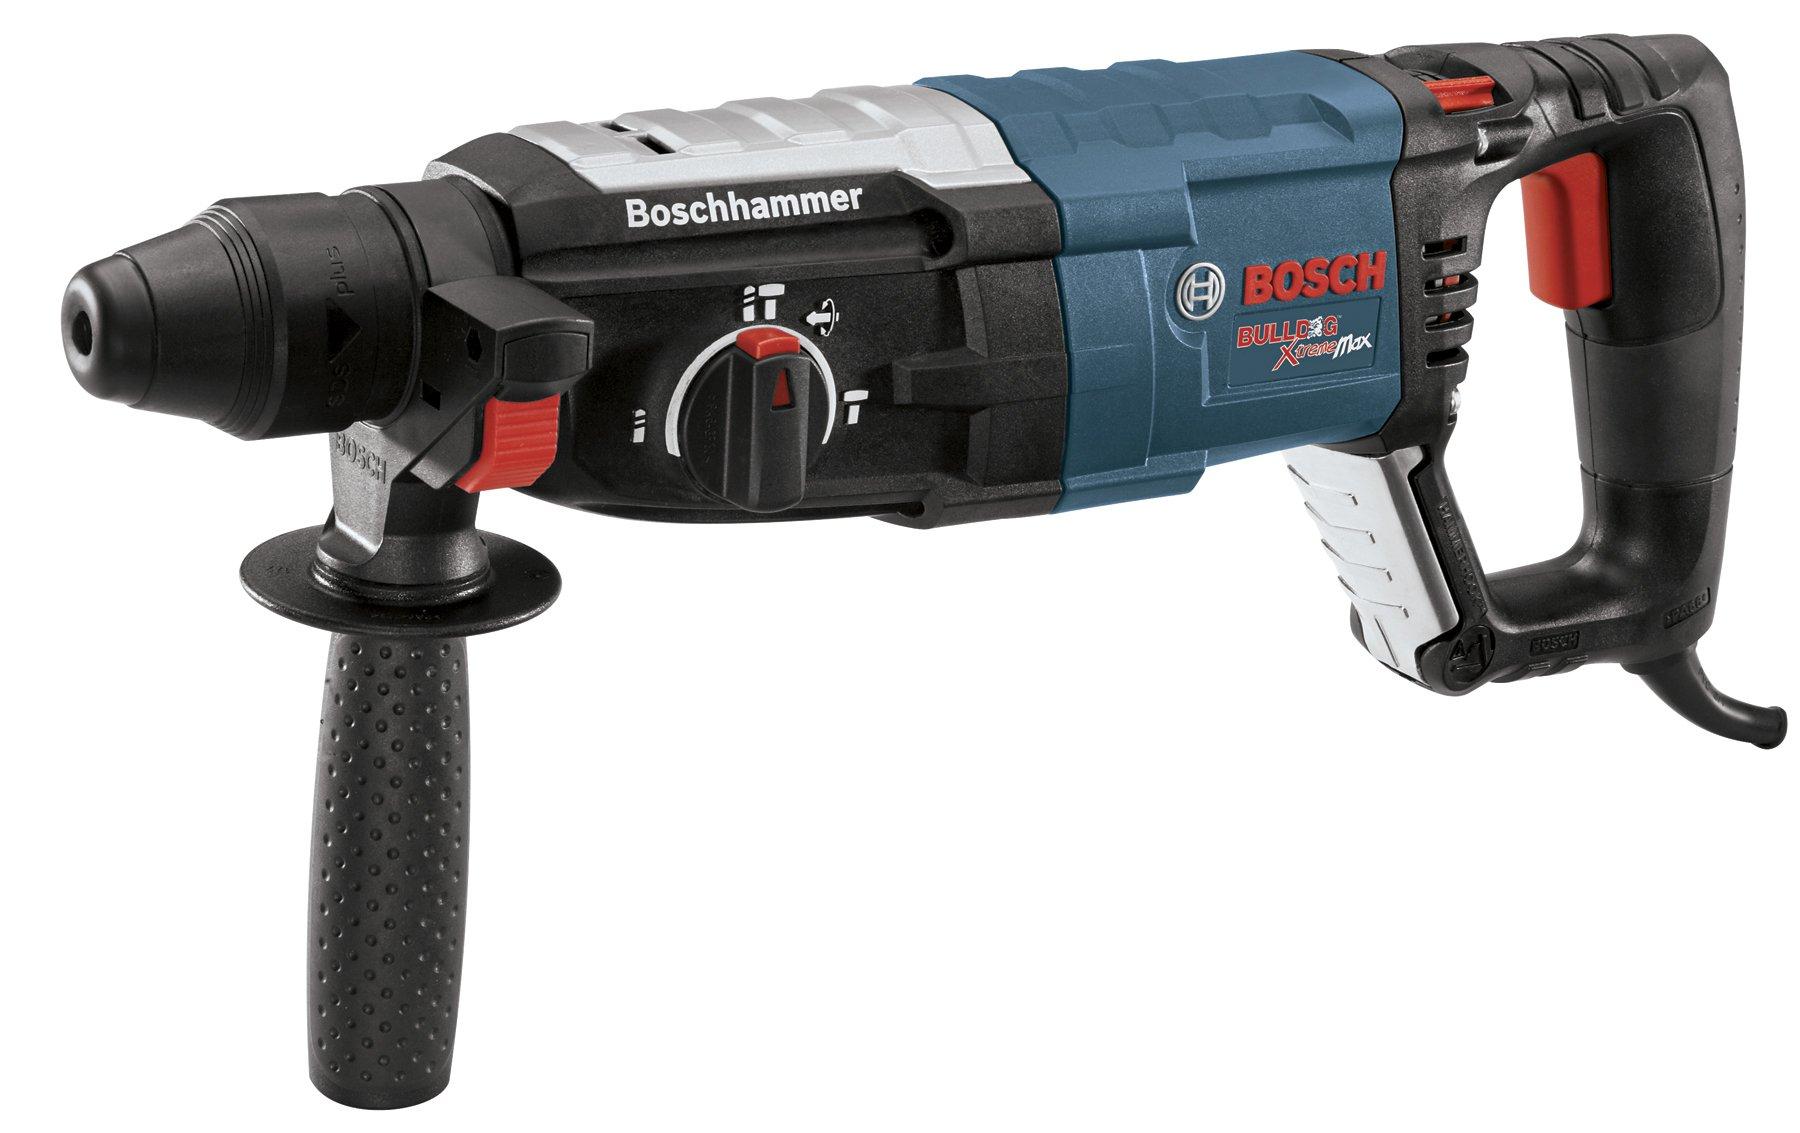 Bosch RH228VC 1-1/8-Inch SDS-plus Rotary Hammer by Bosch (Image #1)